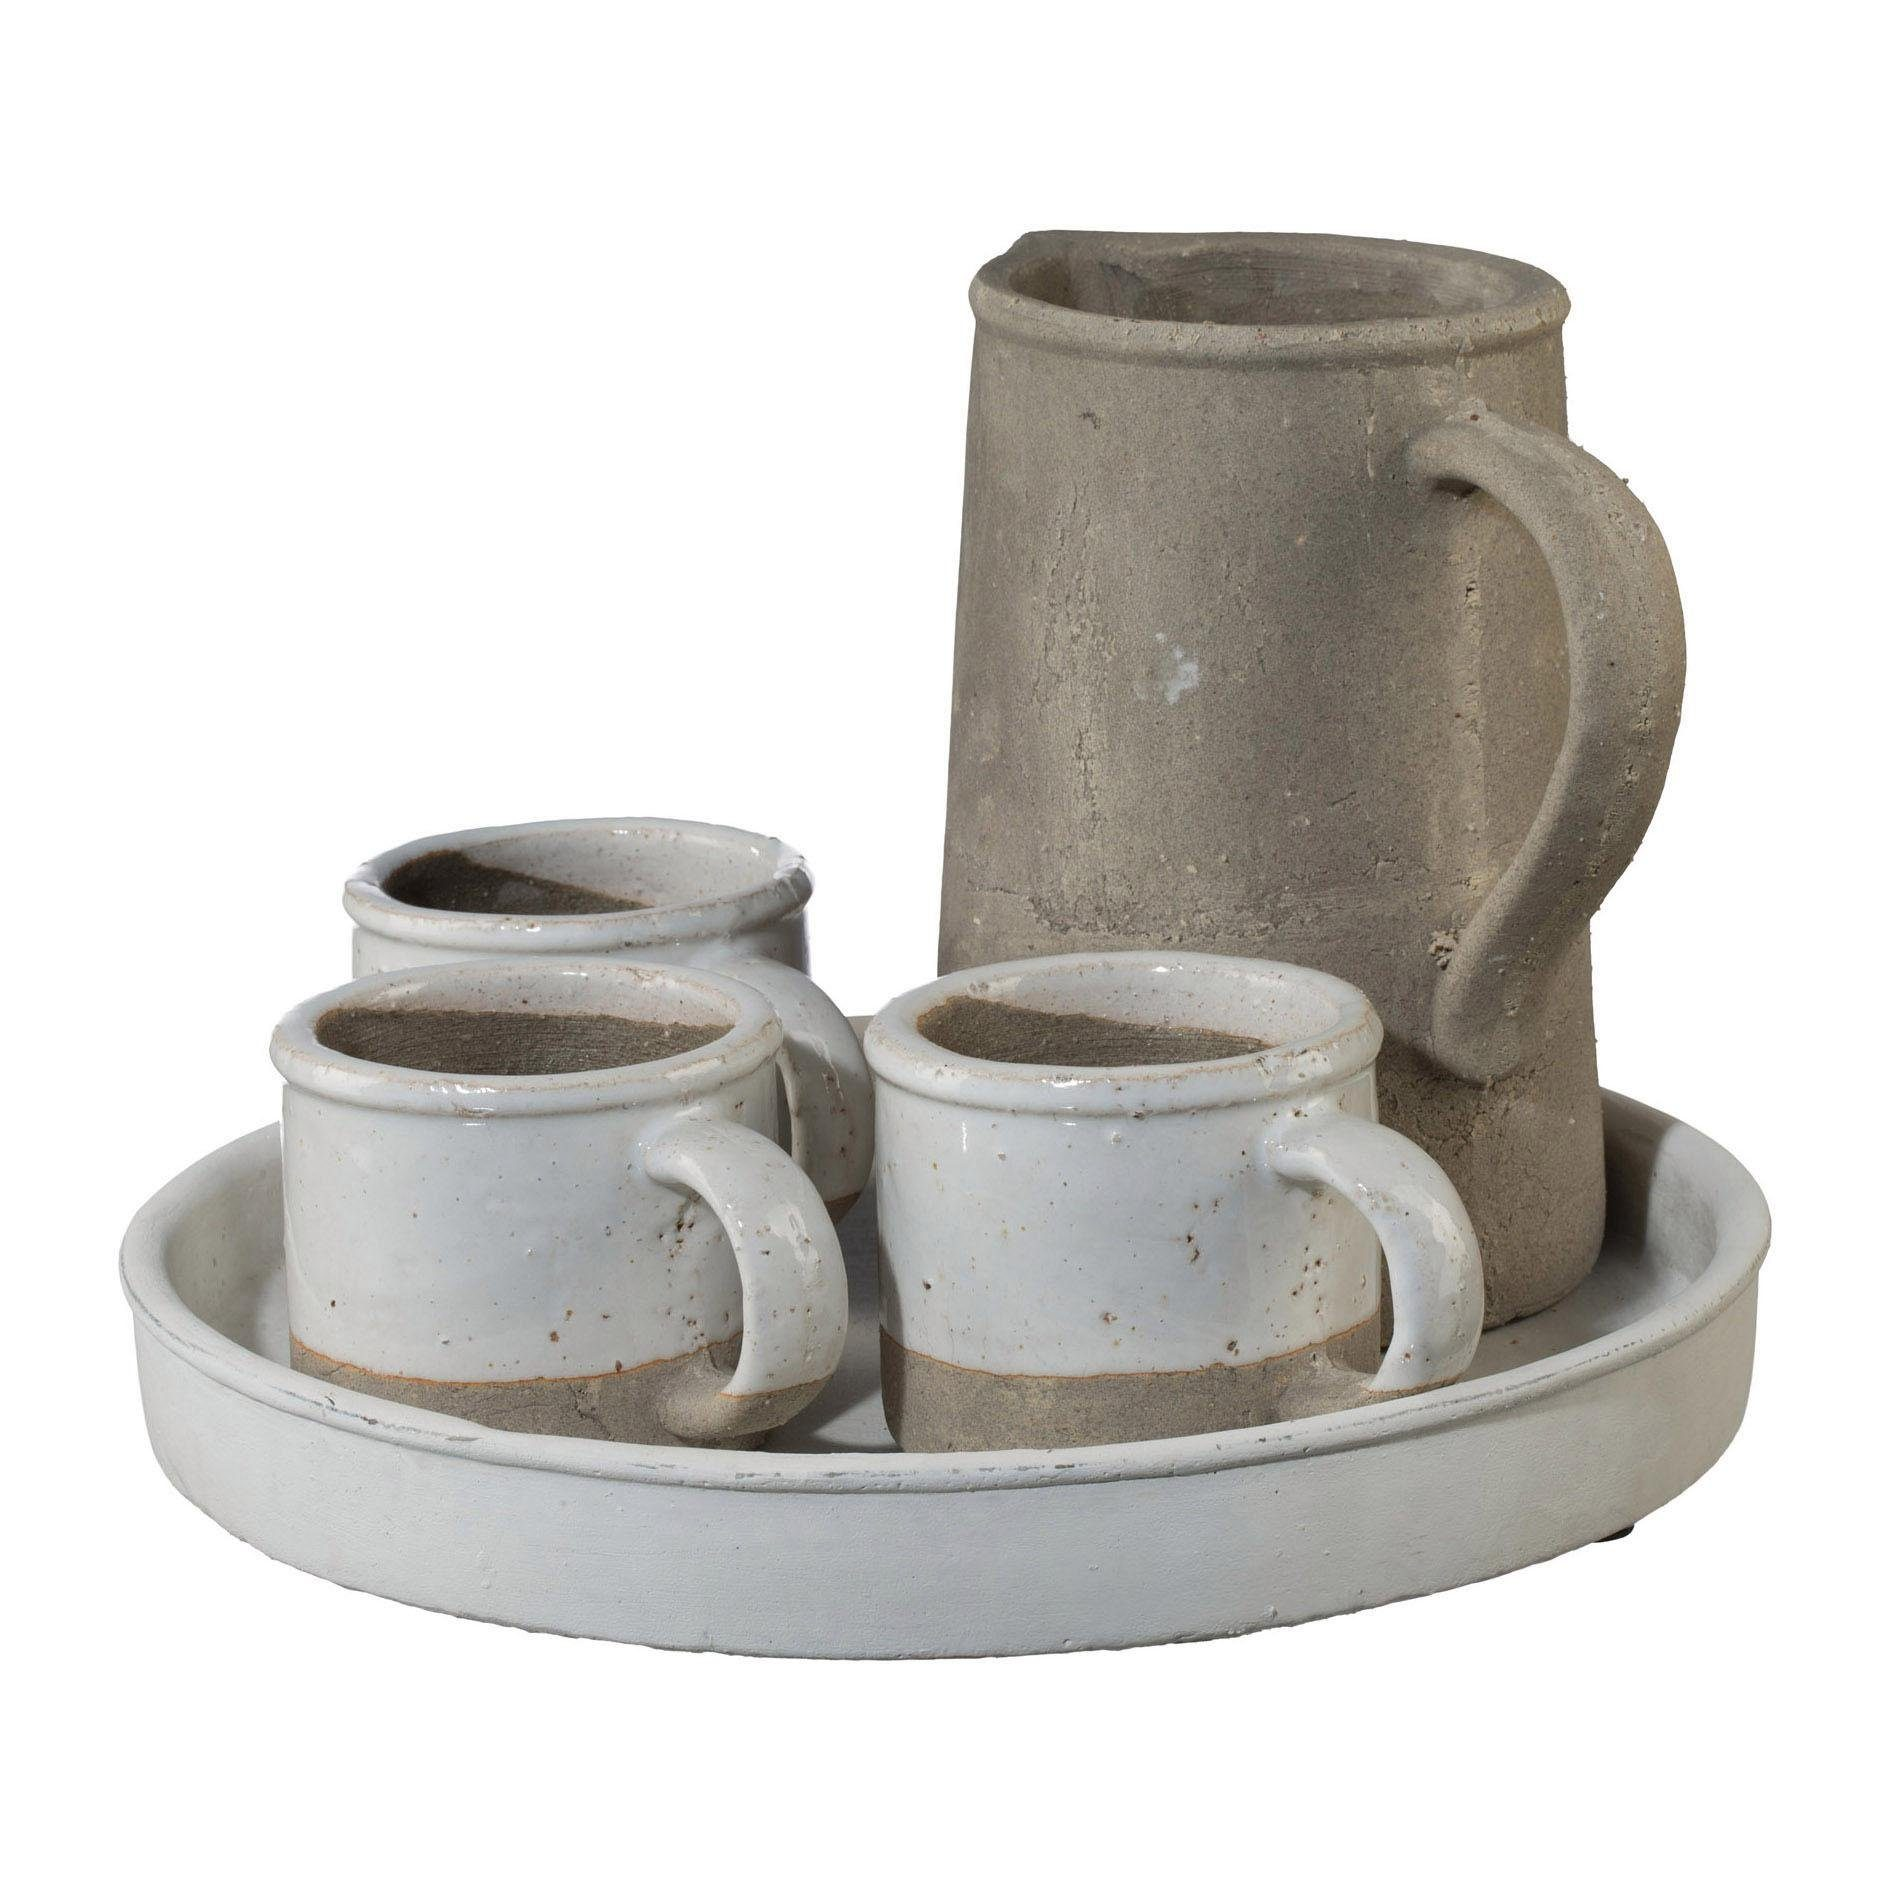 Keramik Outdoor Pflanzbecher x3 / Karaffe auf Tablett